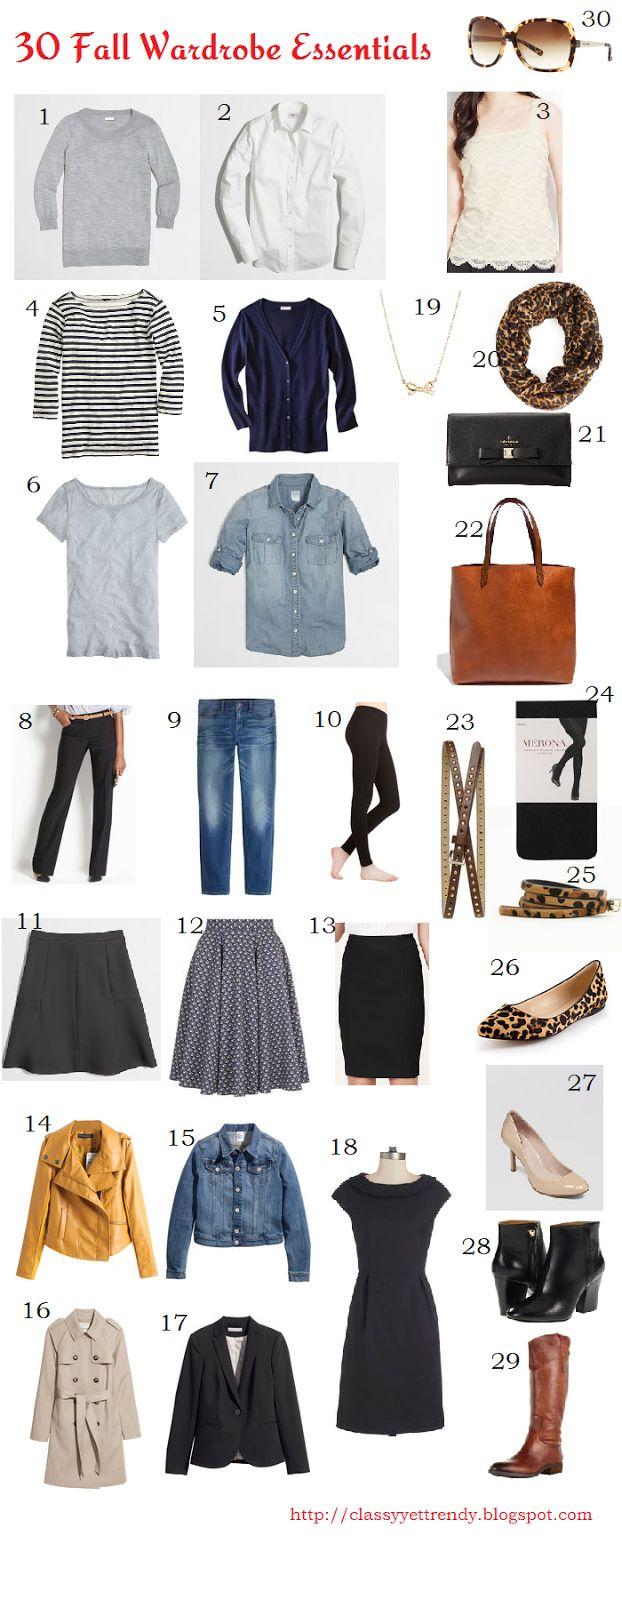 30 Fall Wardrobe Essentials - Classy Yet Trendy